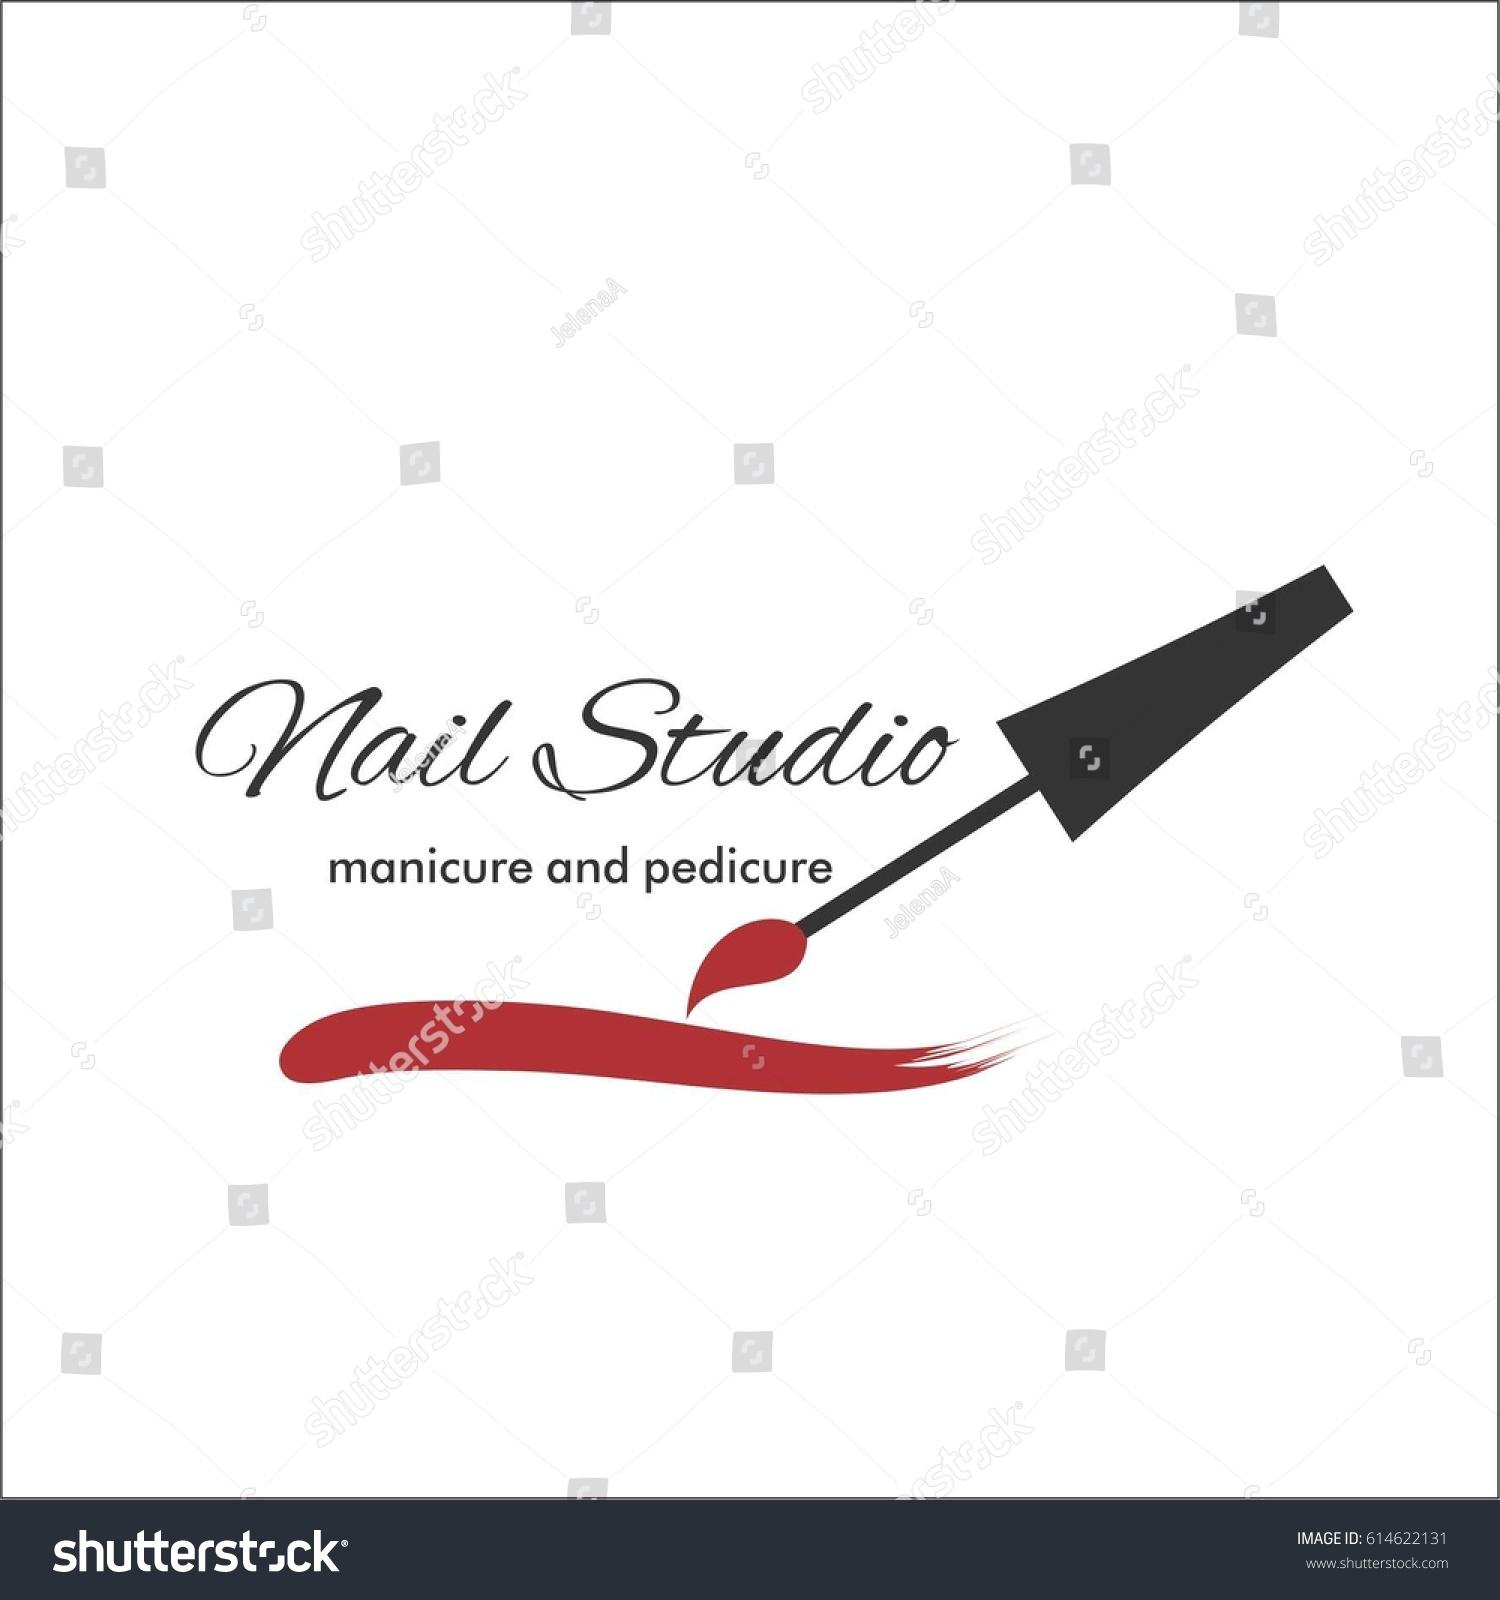 Nail Art Studio Template Logo Stock Vector HD (Royalty Free ...